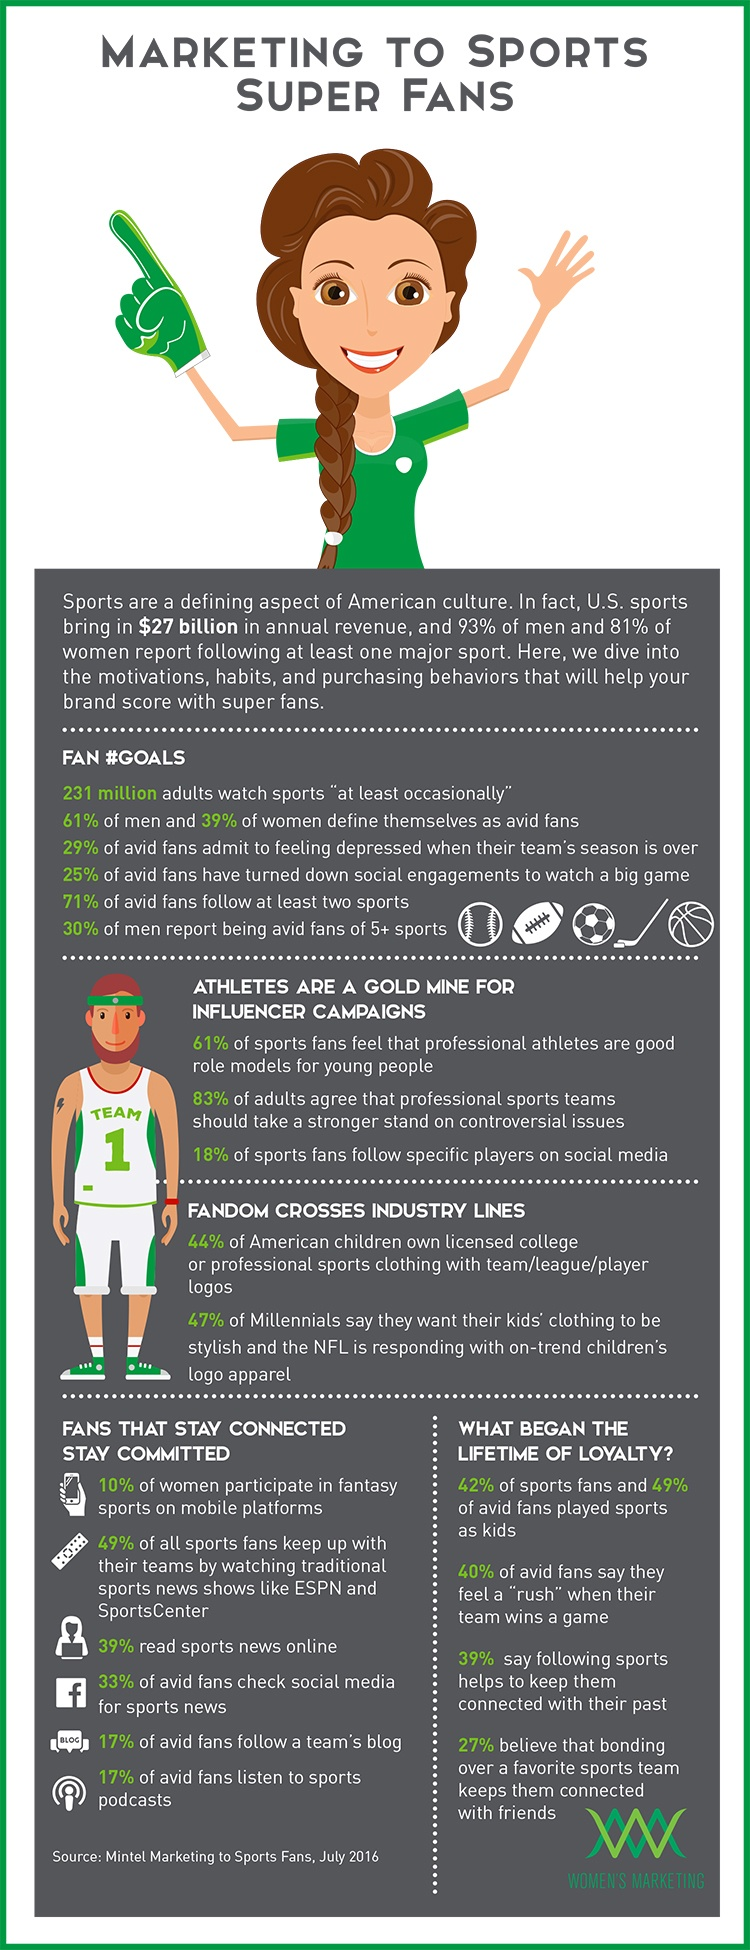 MarketingtoSportsFans_Infographic.jpg